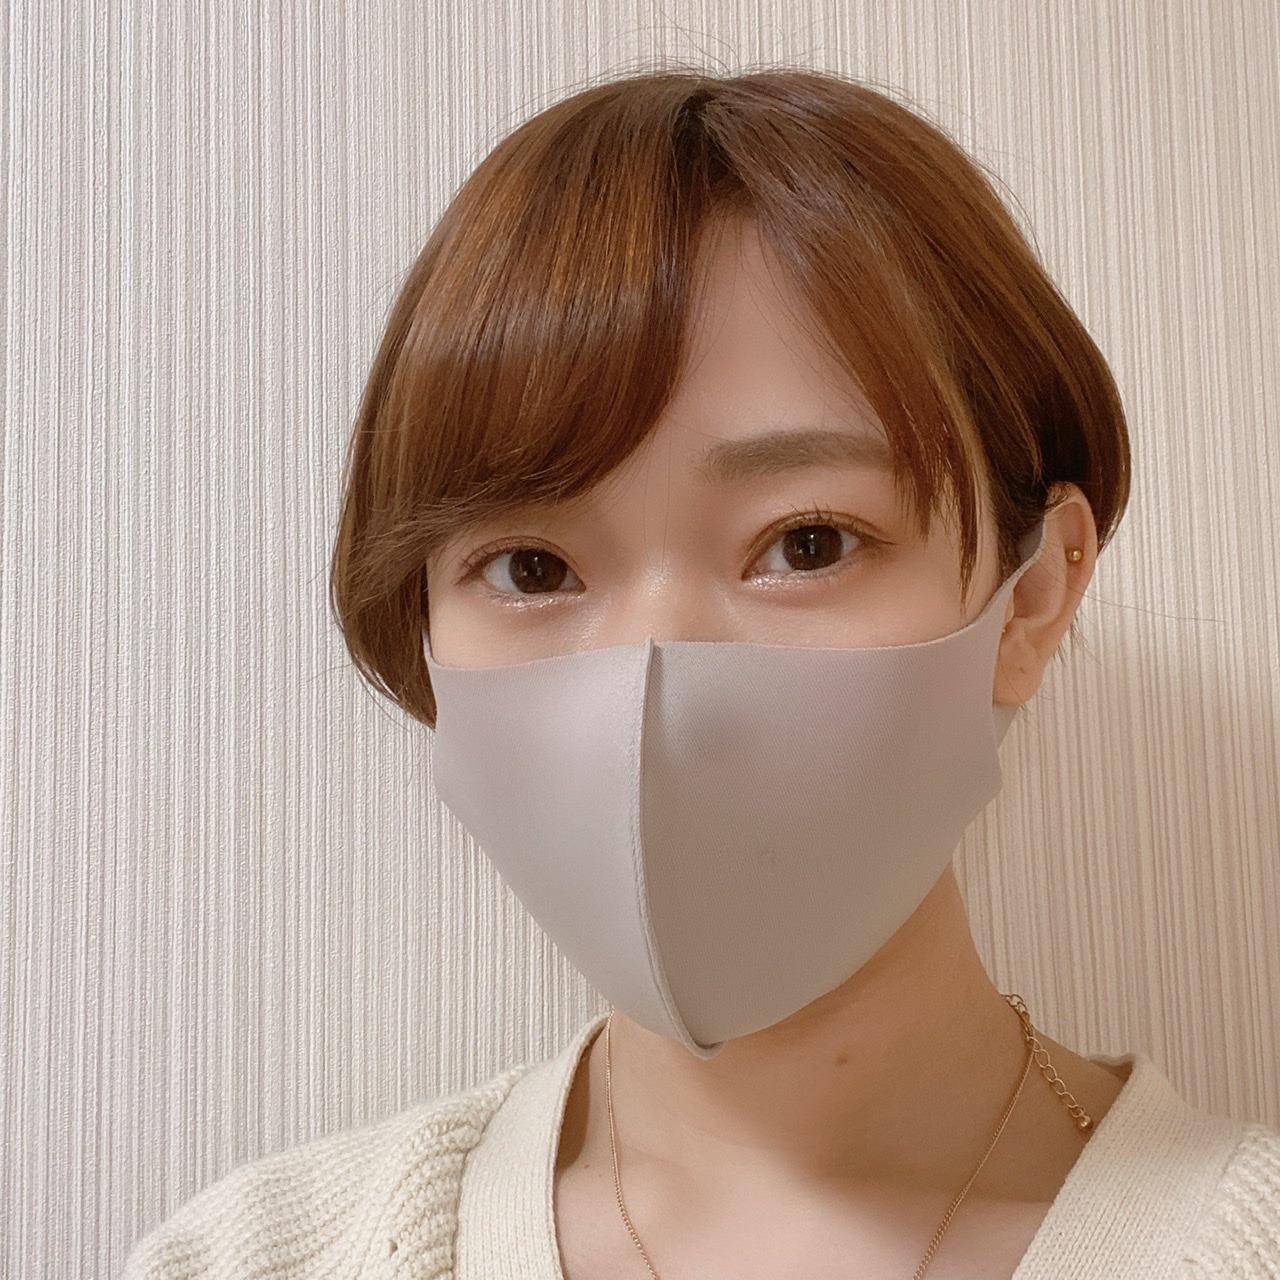 『3COINS』の洗えるマスクが最強説! 通気性もデザインも抜群【今週のMOREインフルエンサーズファッション人気ランキング】_3